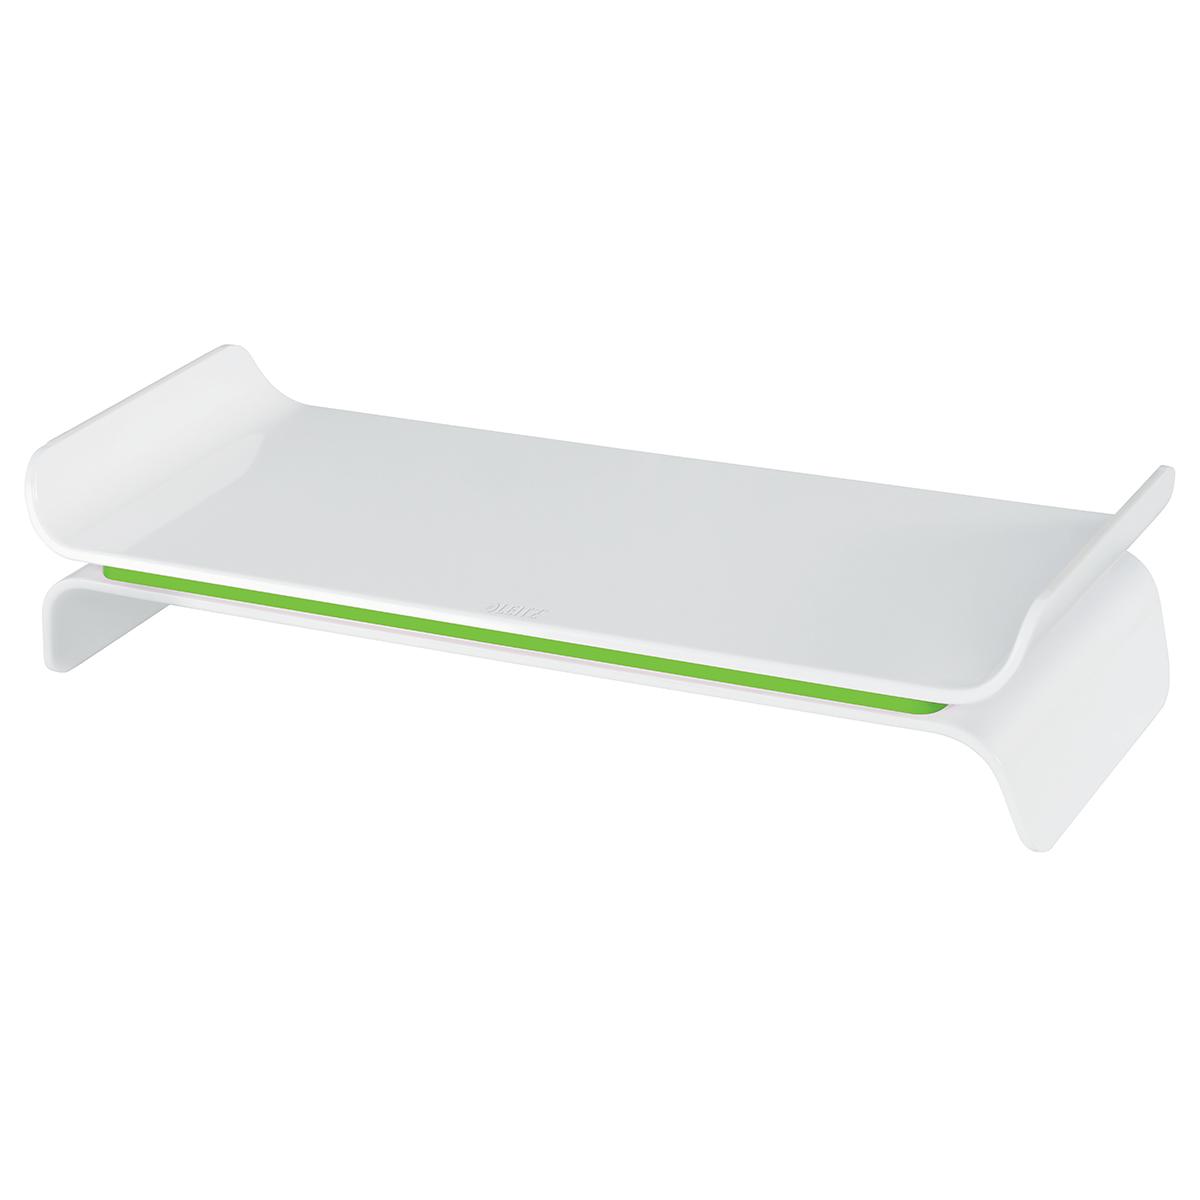 Leitz Ergo WOW Adjustable Monitor Stand Green